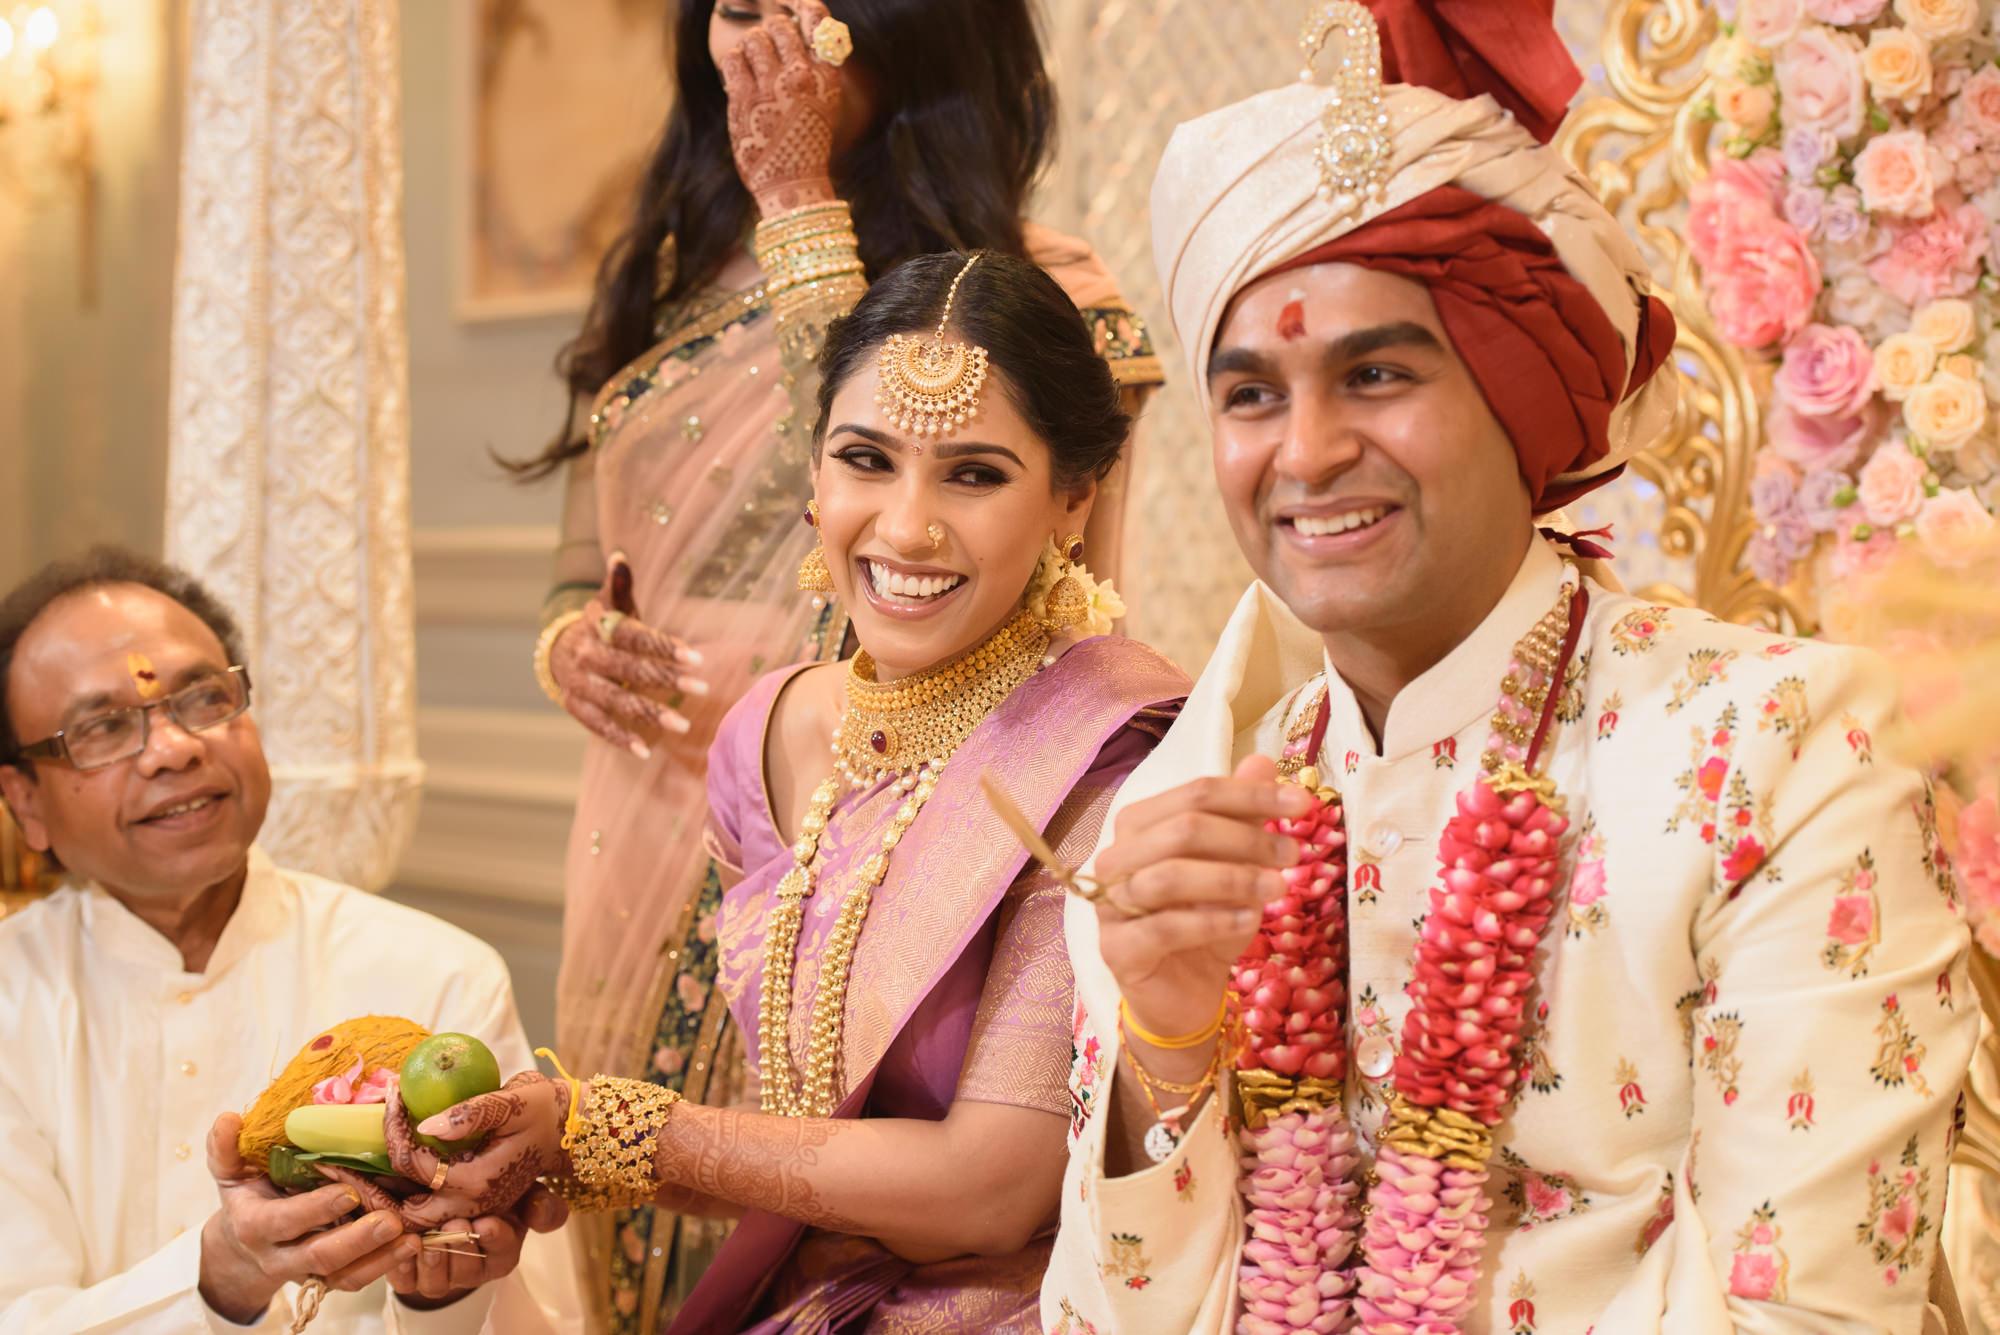 Tamil Gujrati hindu wedding photography photographer london the savoy -48.jpg